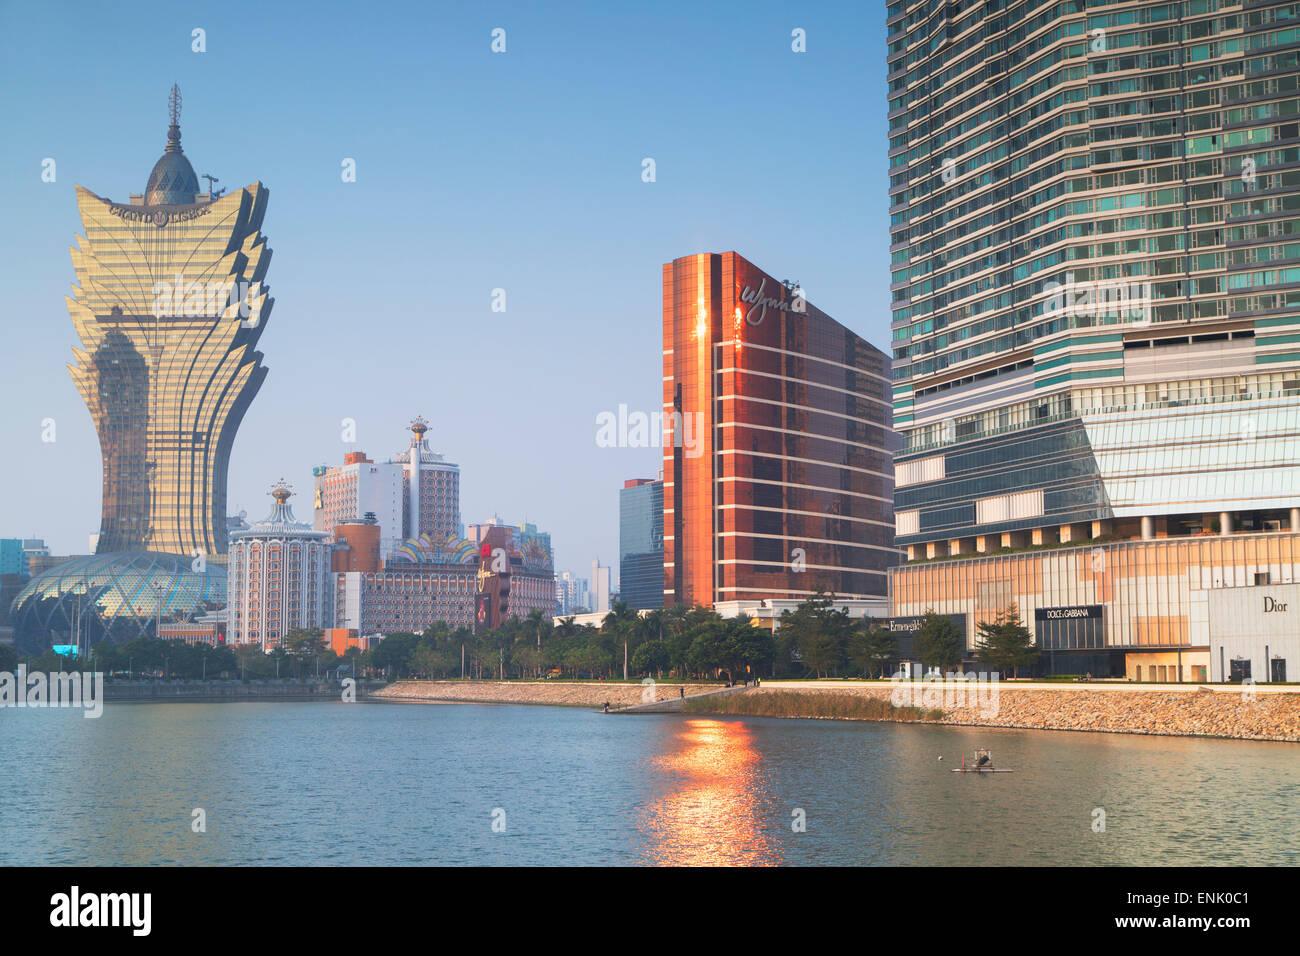 Азия казино город создам онлайн казино